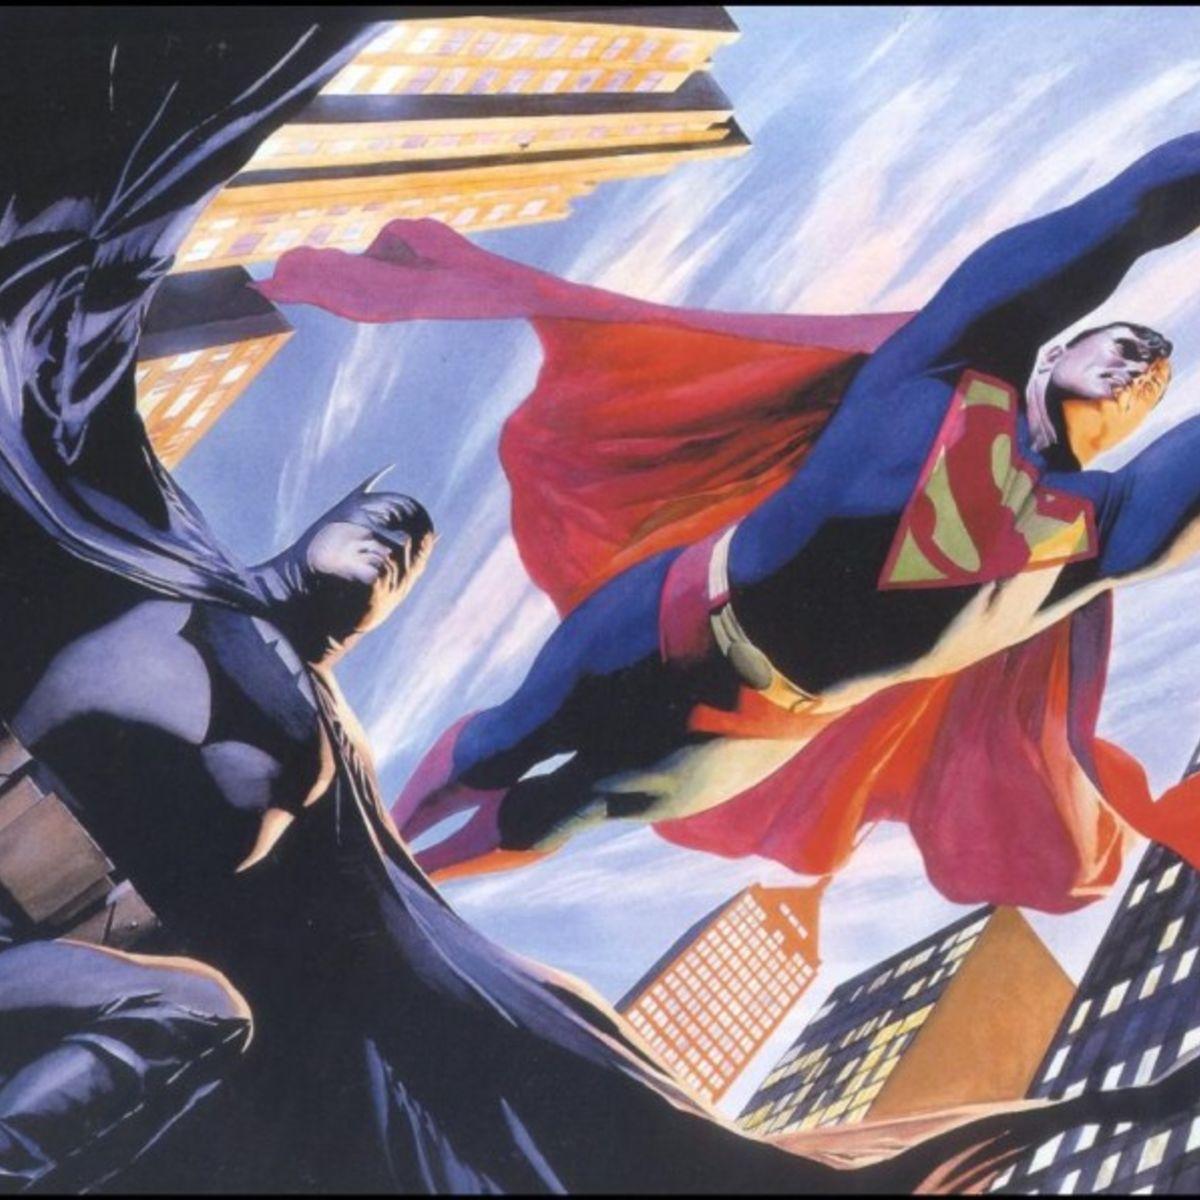 BatmanSuperman.jpg